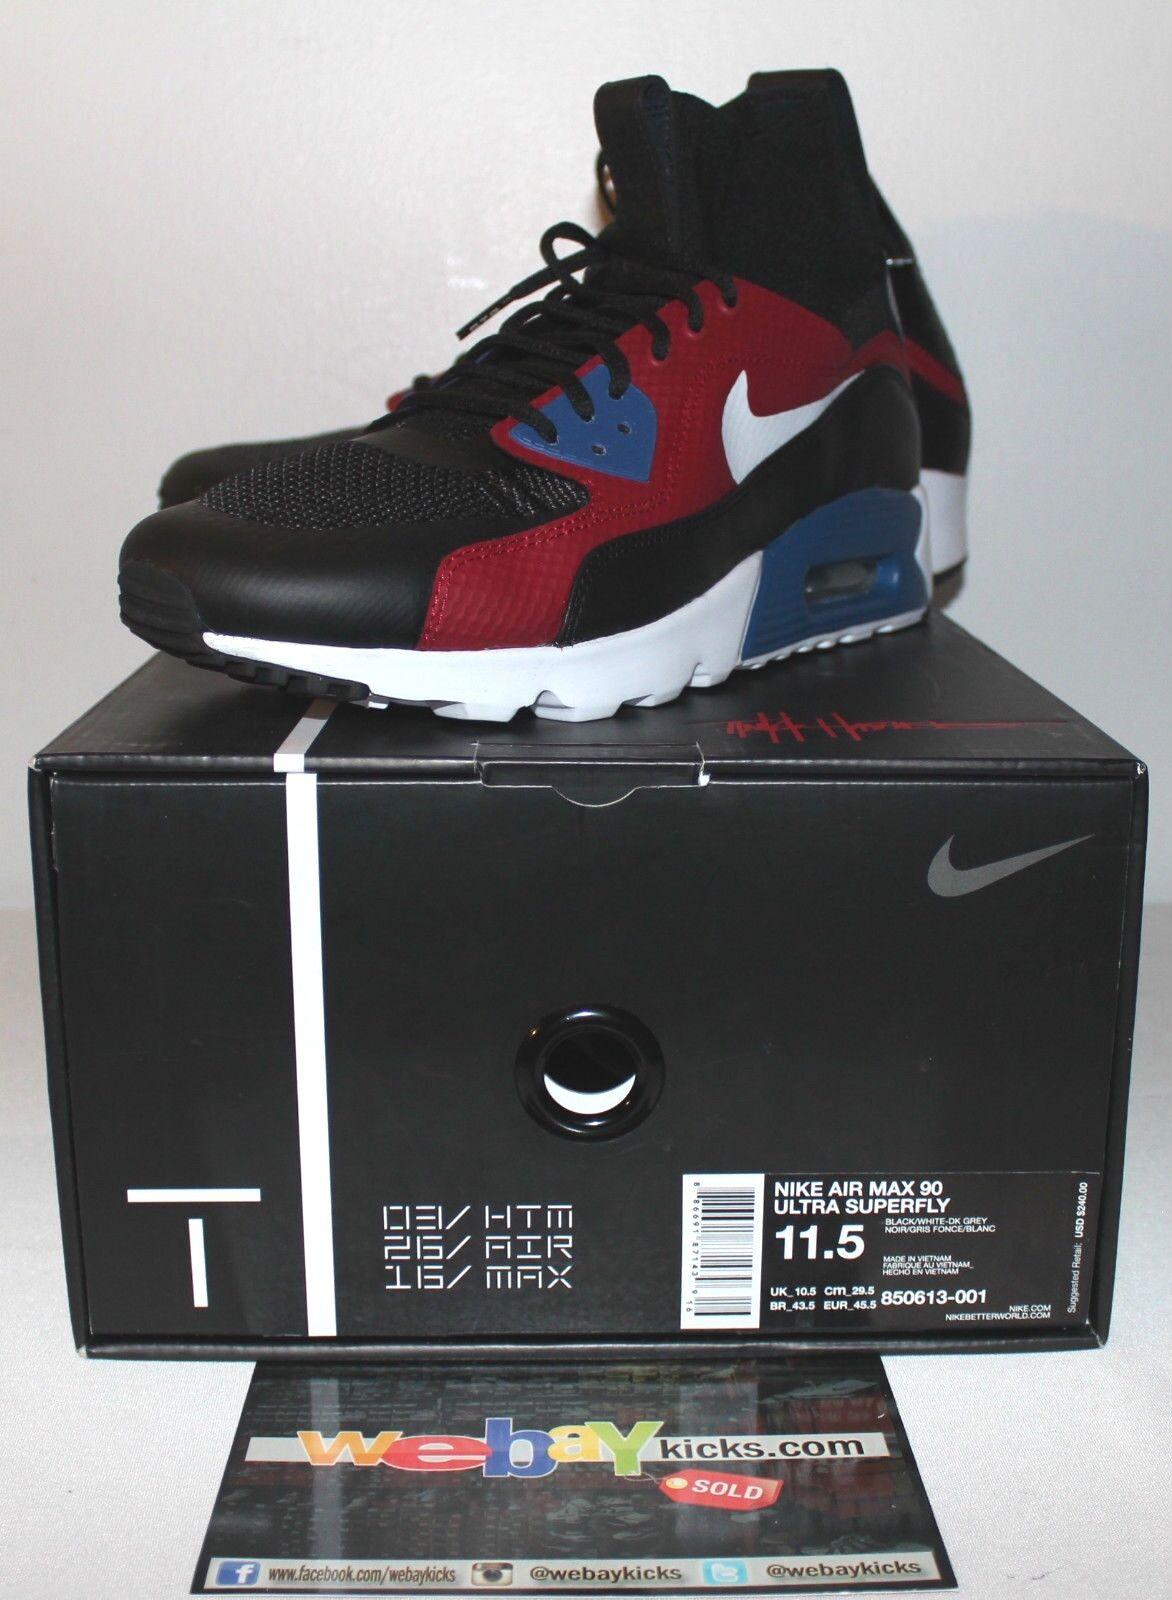 Nike Air Max 90 Multi Ultra SuperFly Tinker Hatfield Multi 90 Baskets Hommes 1aae17